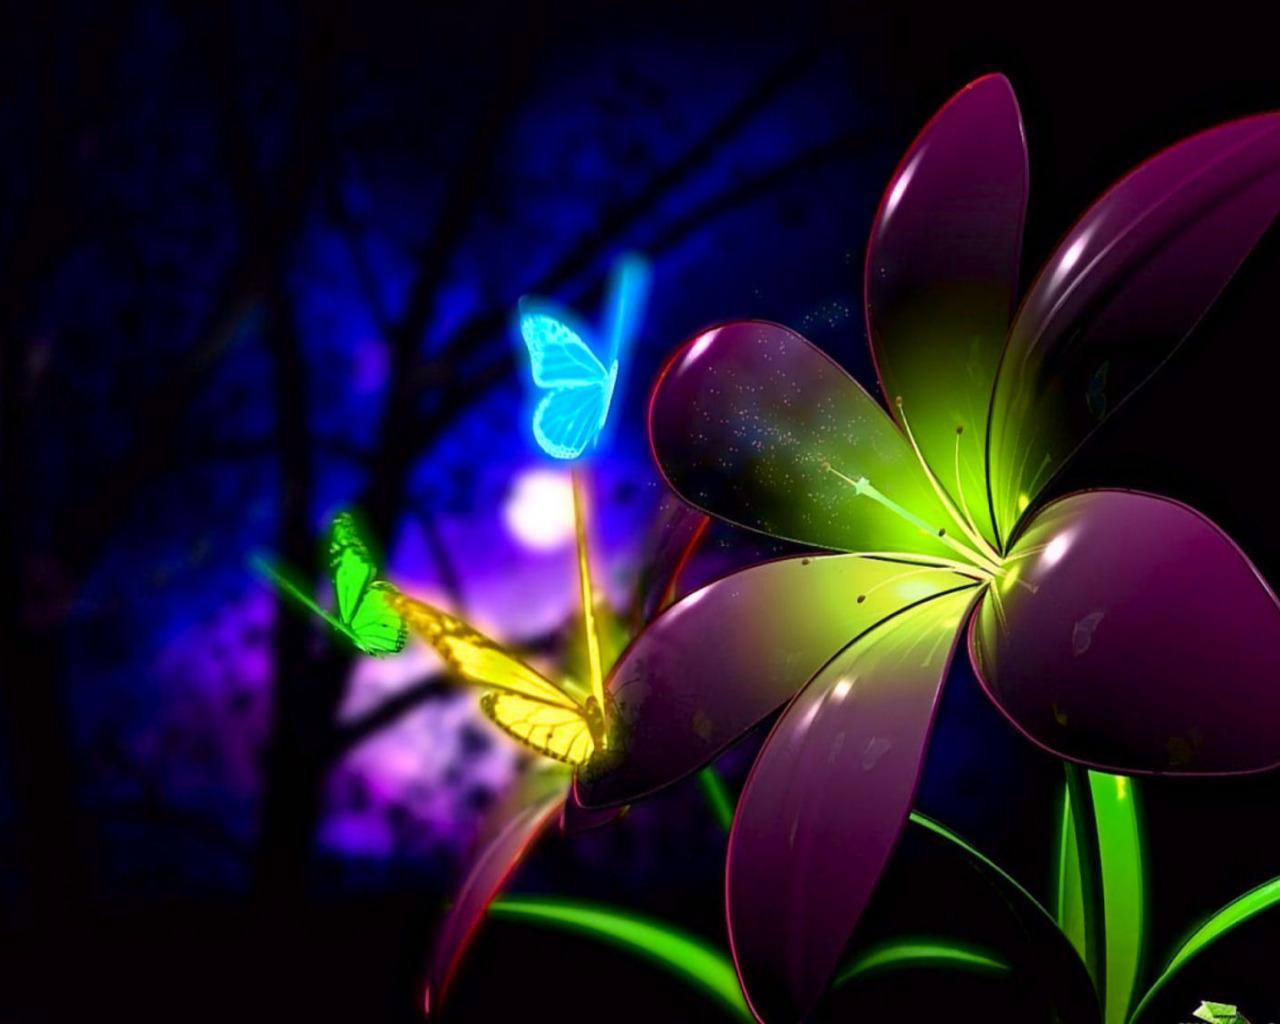 http://3.bp.blogspot.com/-s73MfO5gBjI/T-mVZMur7KI/AAAAAAAACwE/Z6mq1oTixCA/s1600/flor-e-borboletas-luminosas-imagens-imagem-de-fundo-wallpaper-para-pc-computador-tela-gratis-ambiente-de-trabalho.jpg